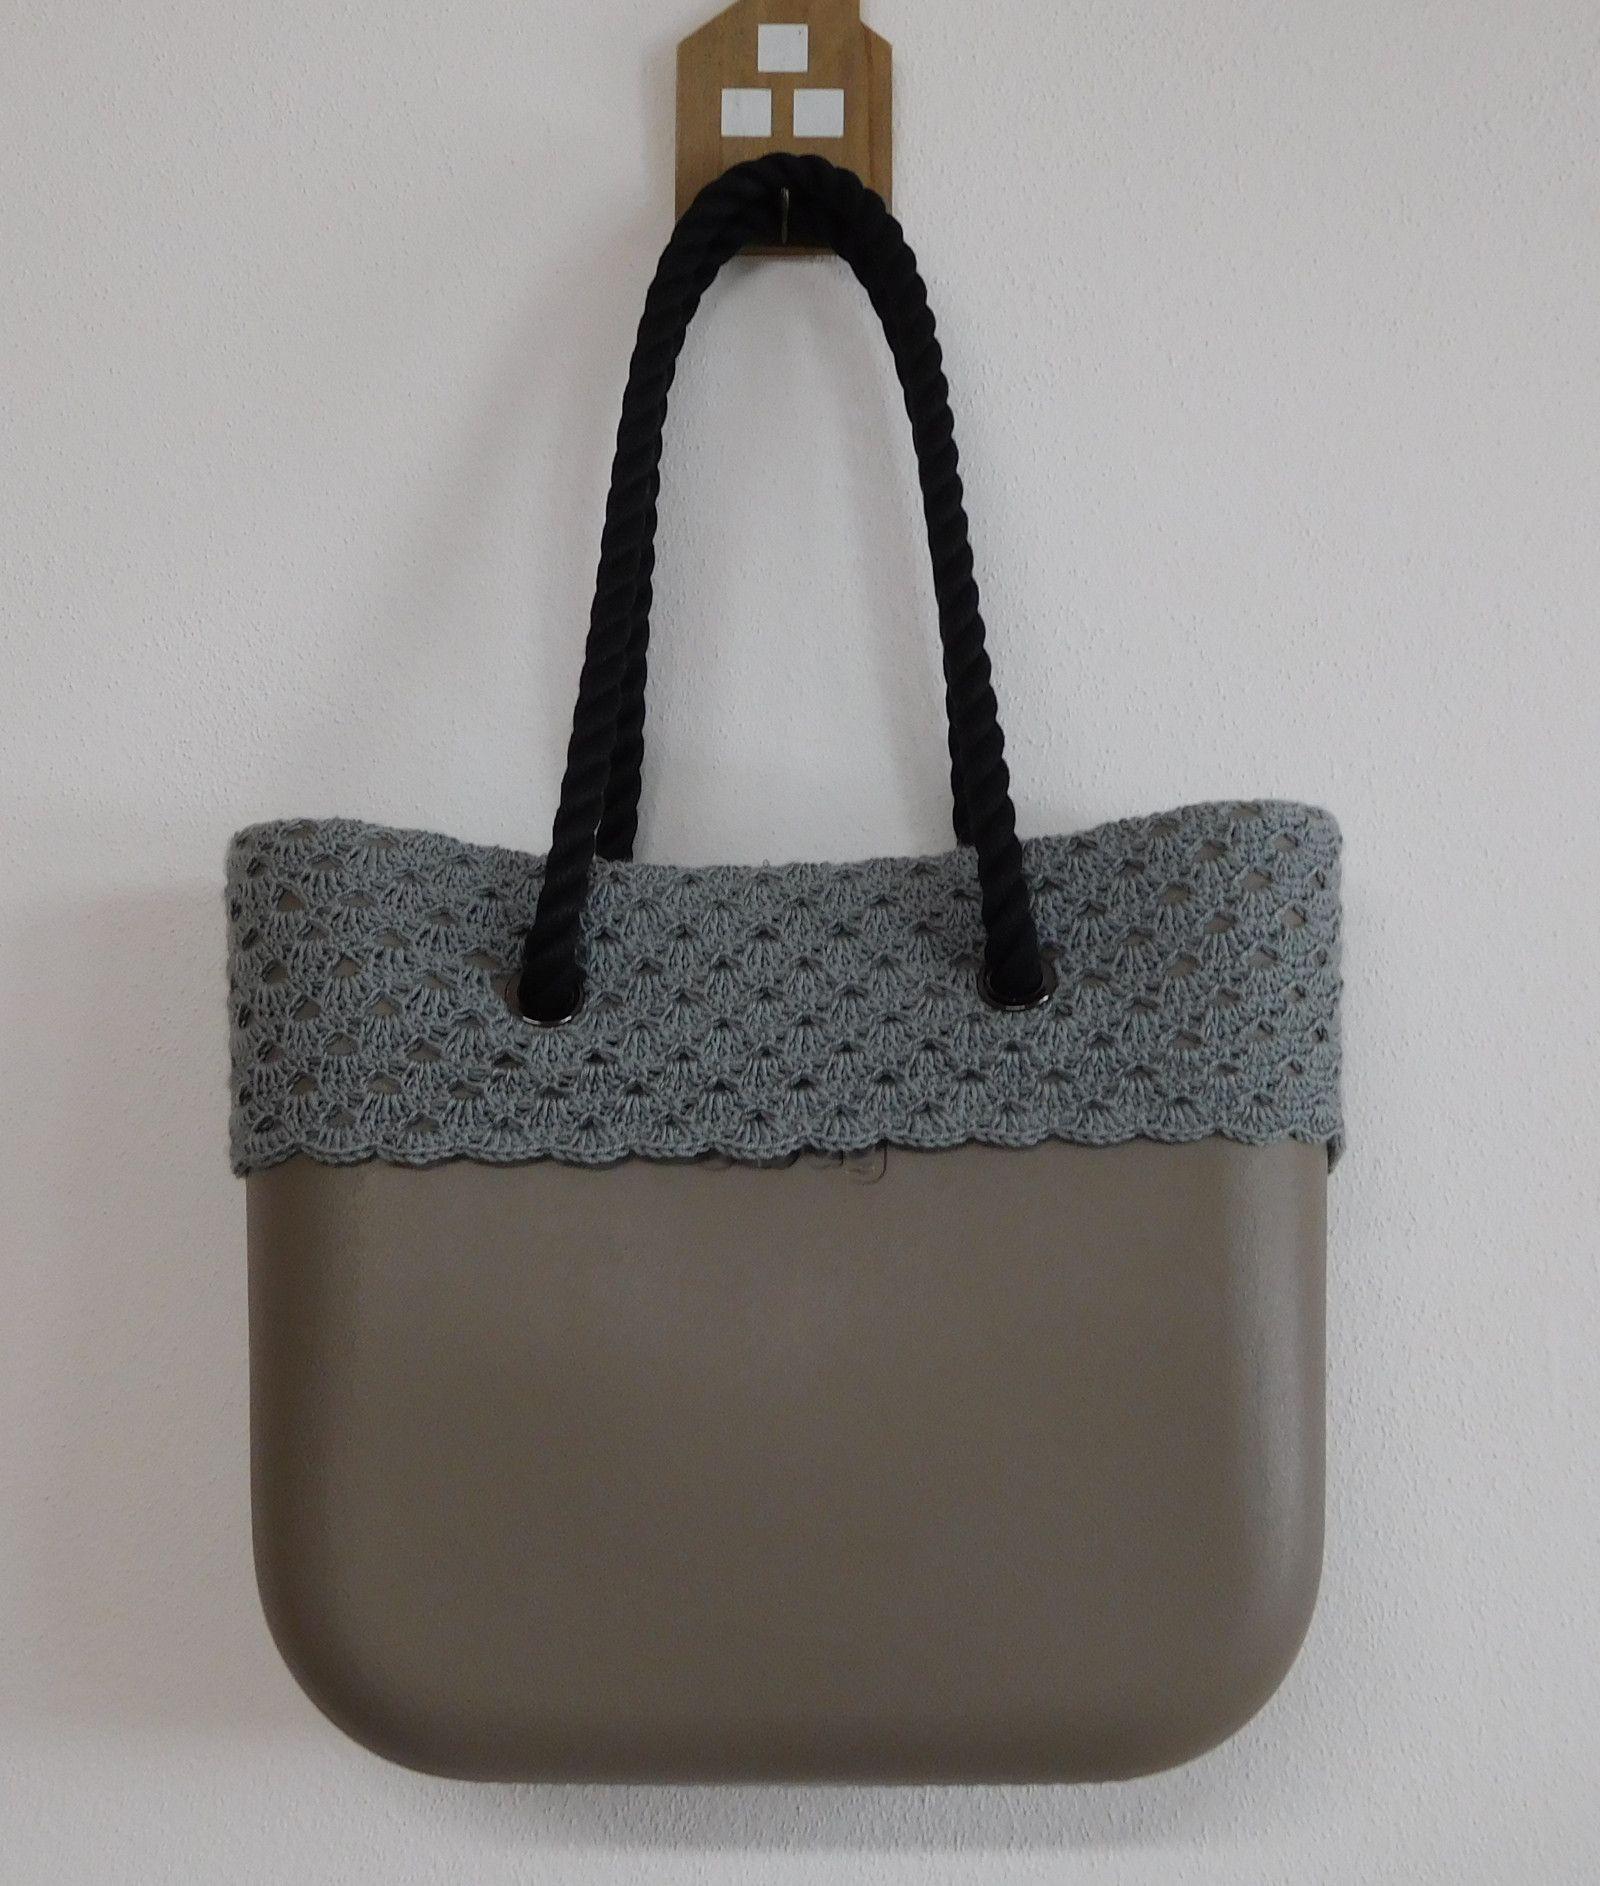 fd24b3172 Na Háčkovaný ObagKabelky Tašky A Svetřík Pinterest Bags qMVzSUp